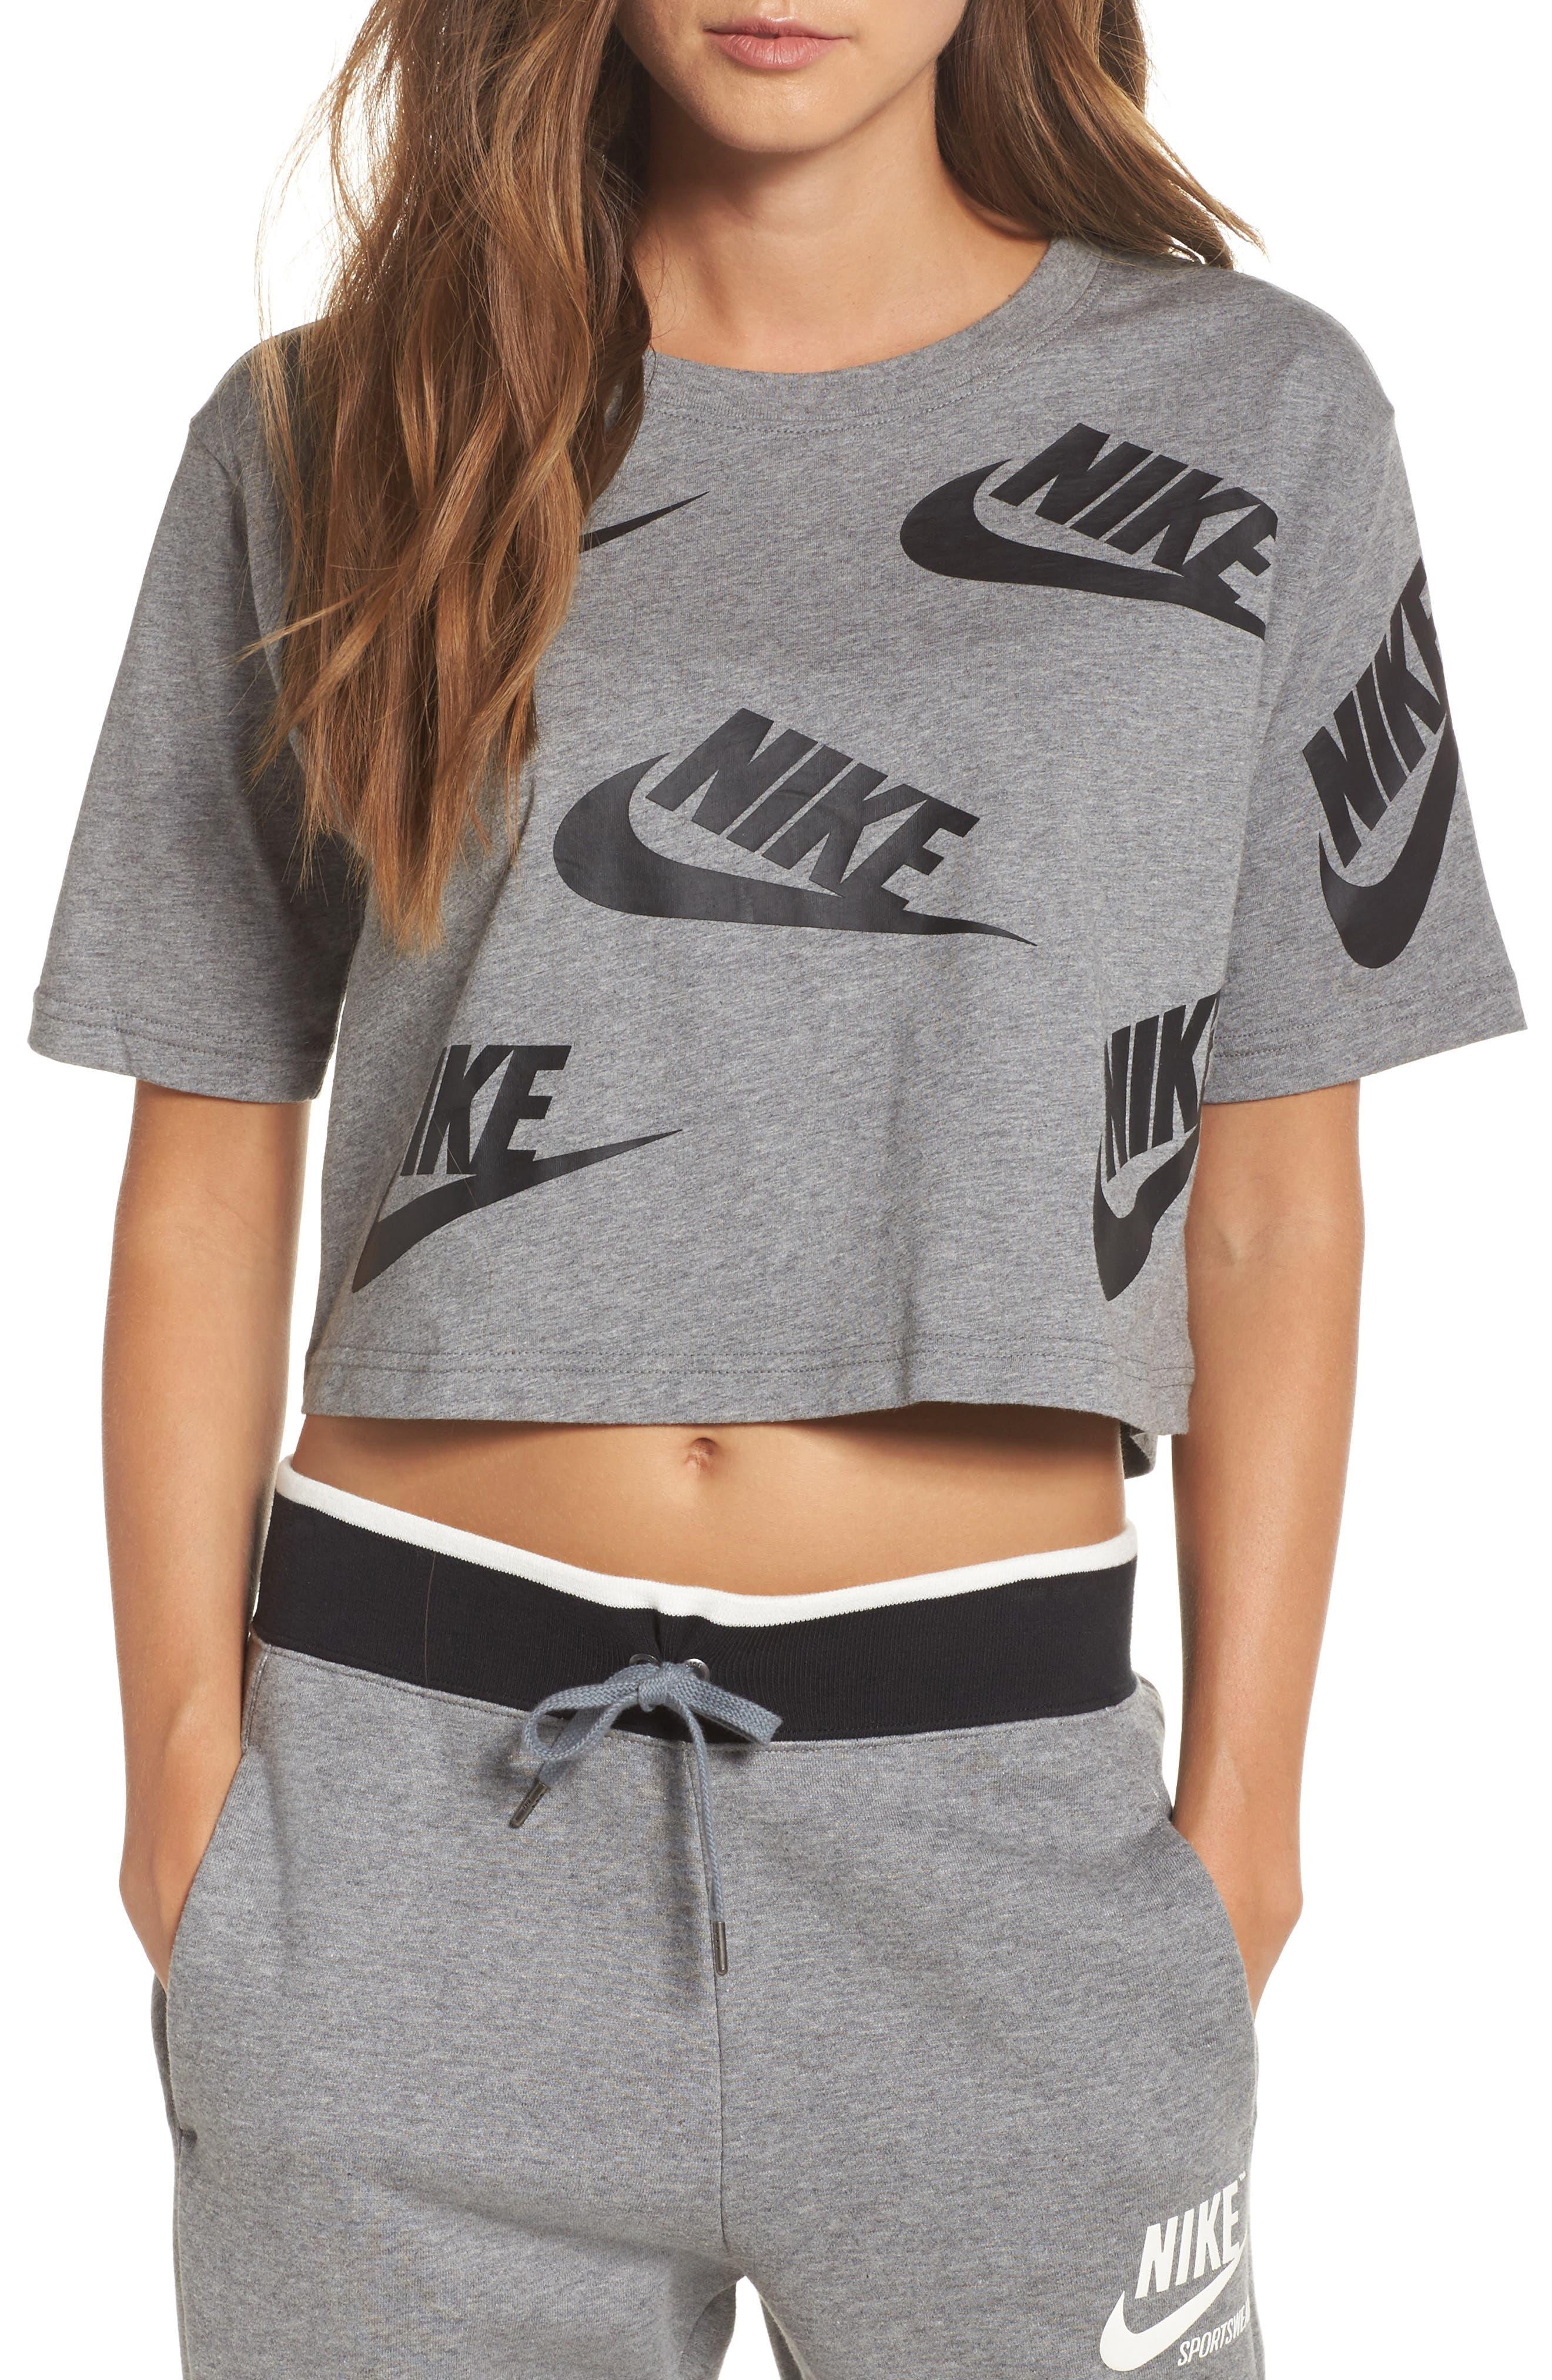 Alternate Image 1 Selected - Nike Sportswear Futura Crop Tee